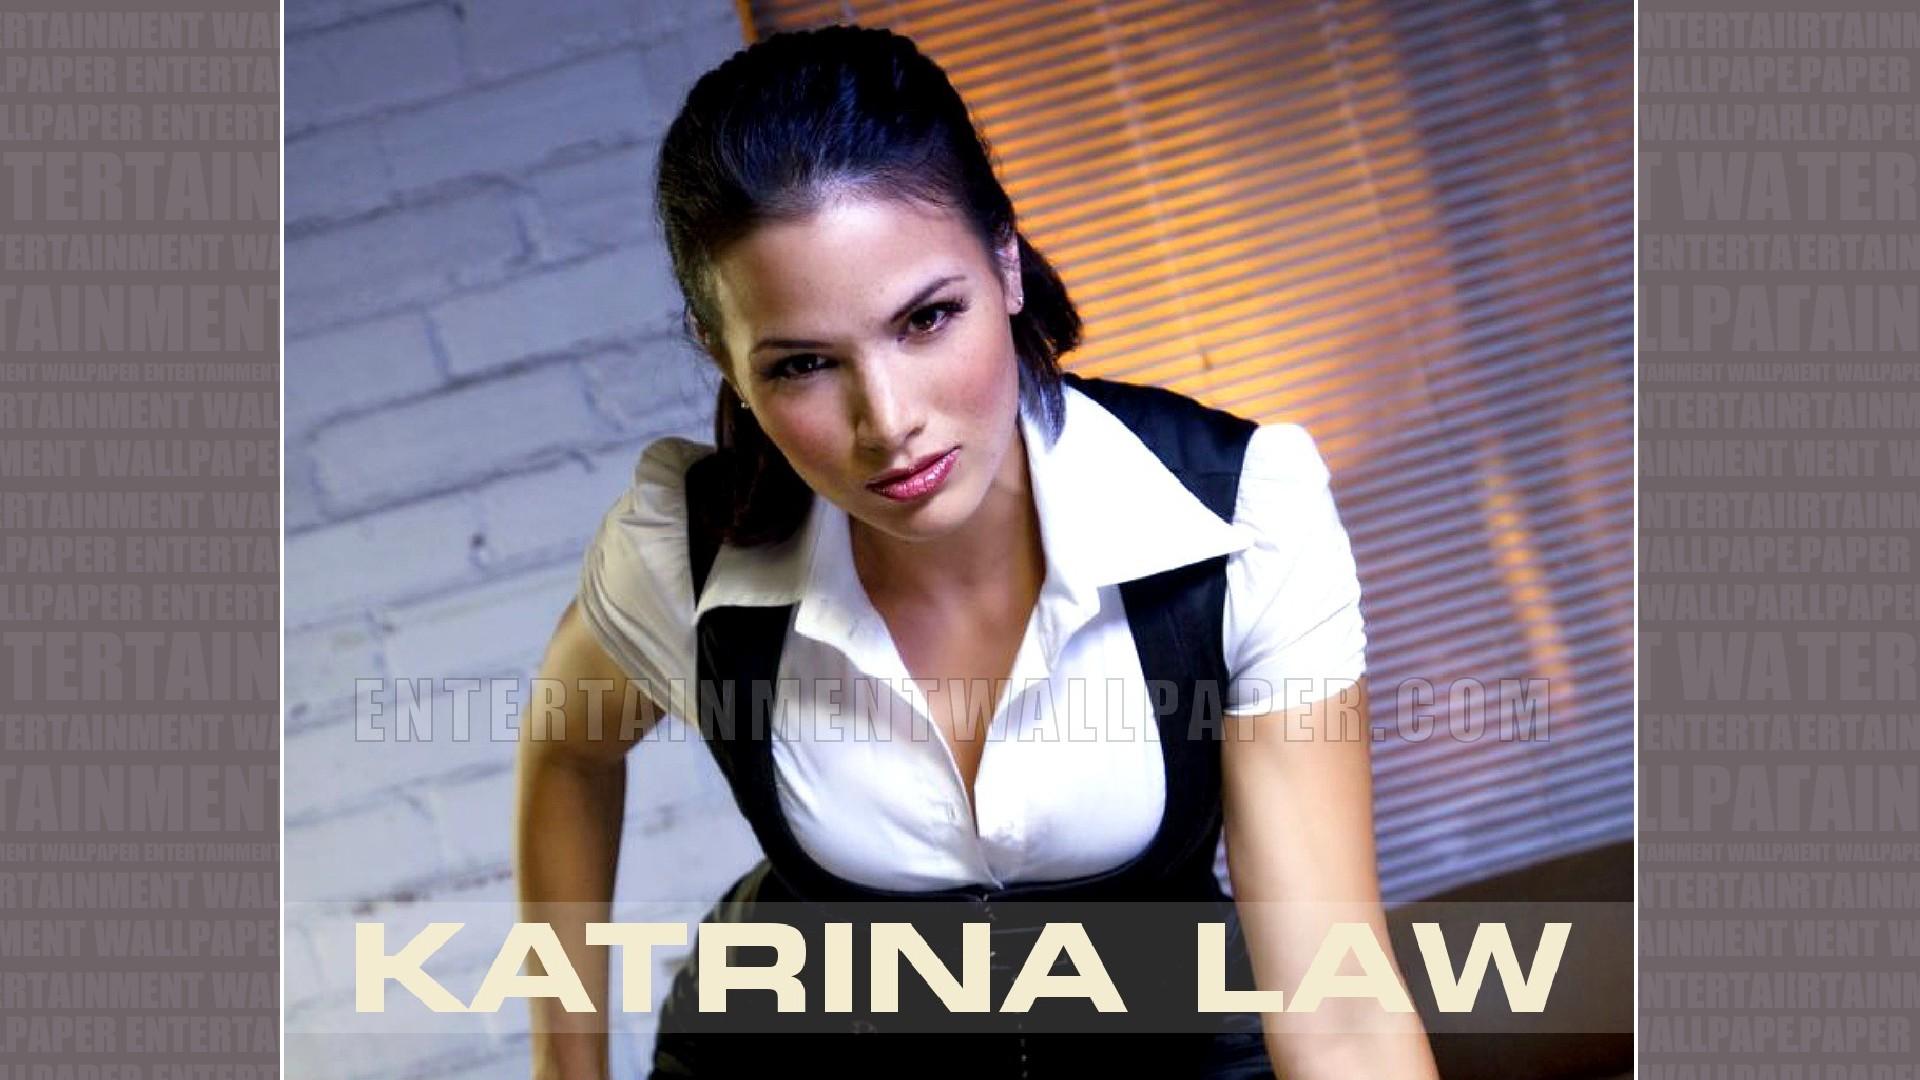 Katrina Law Wallpaper - Original size, download now.